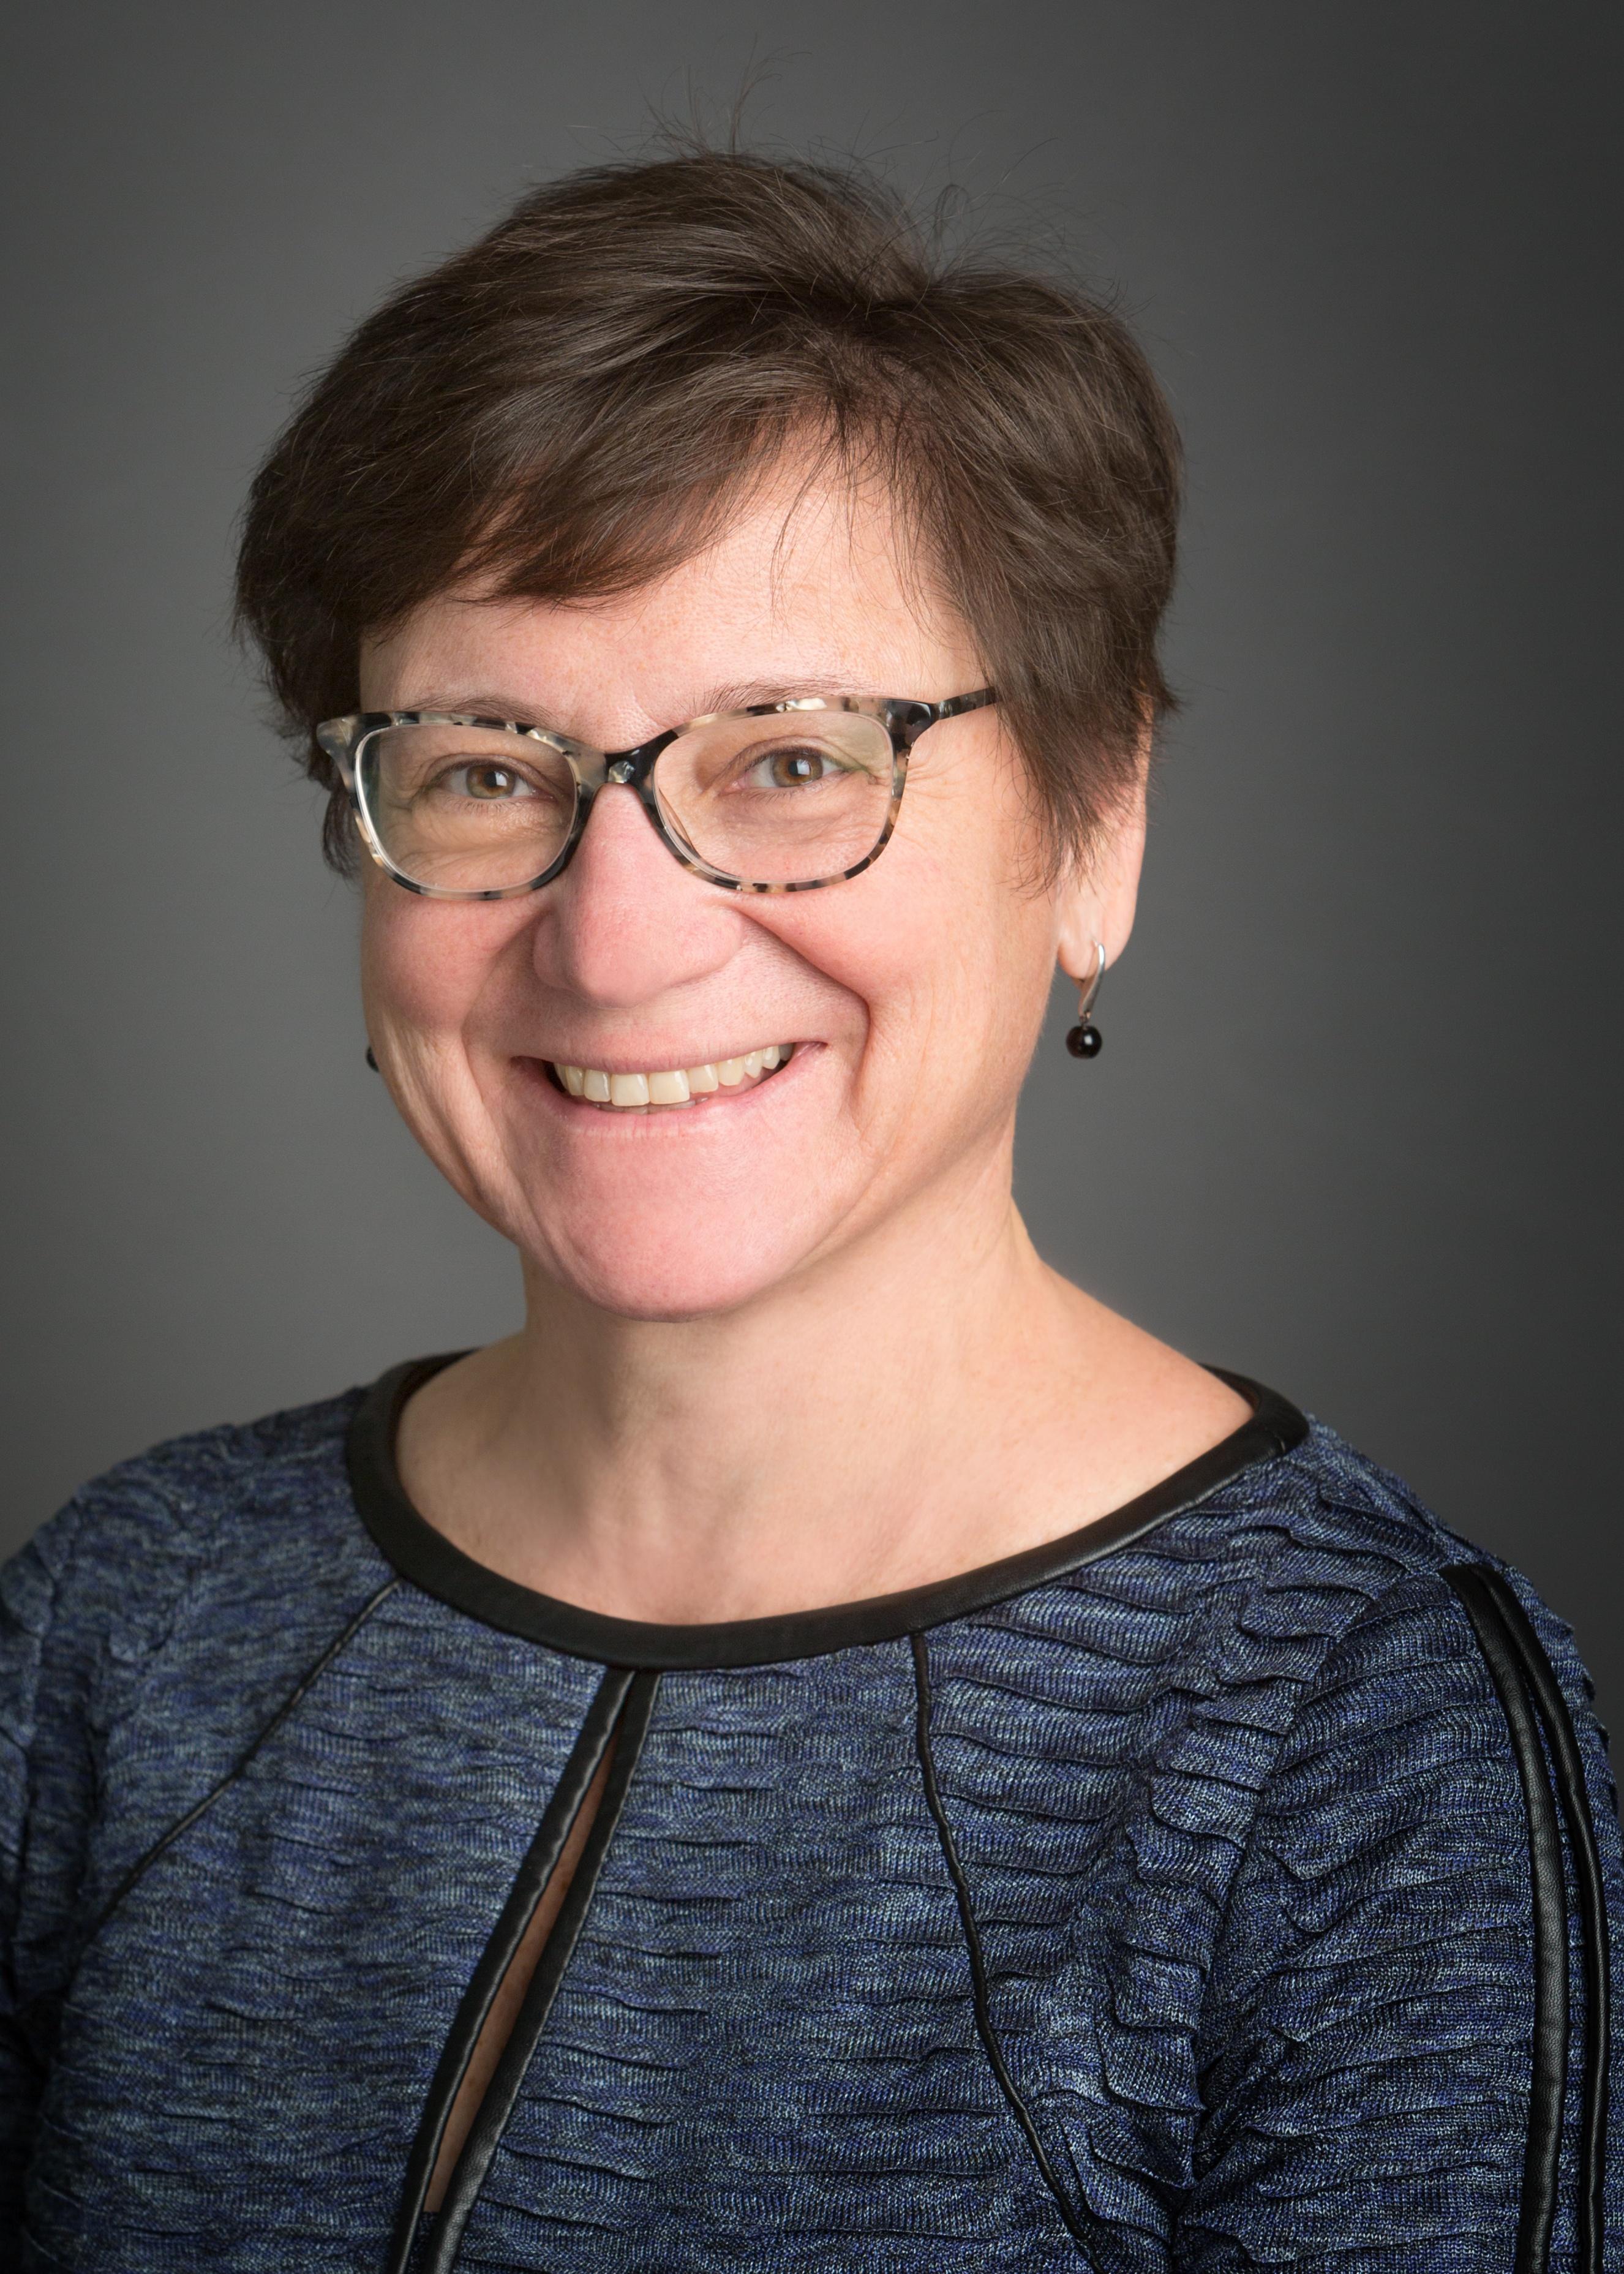 Helen Konrad